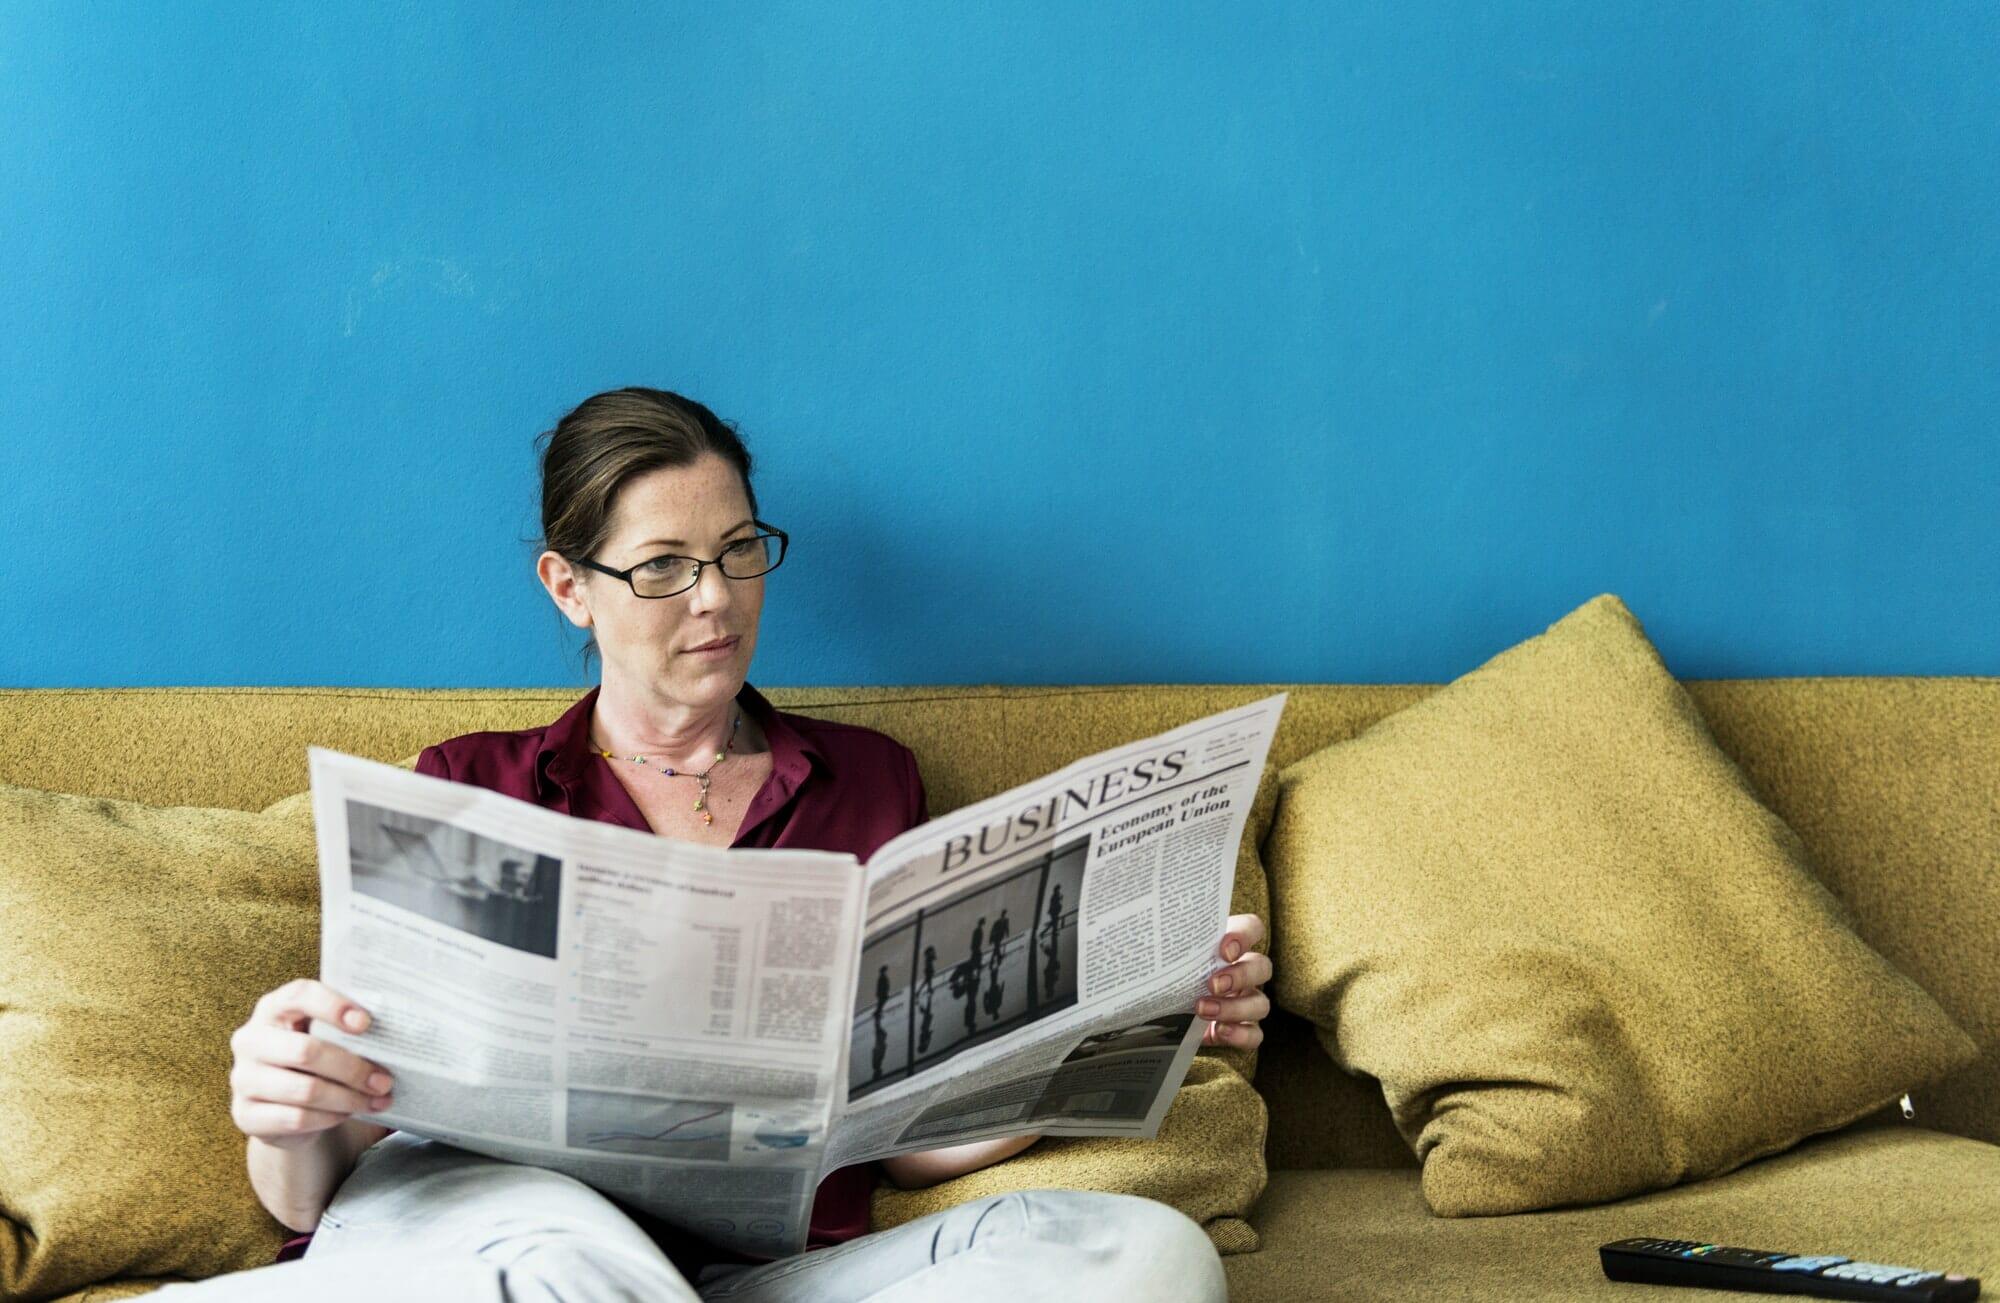 Caucasian woman reading the newspaper